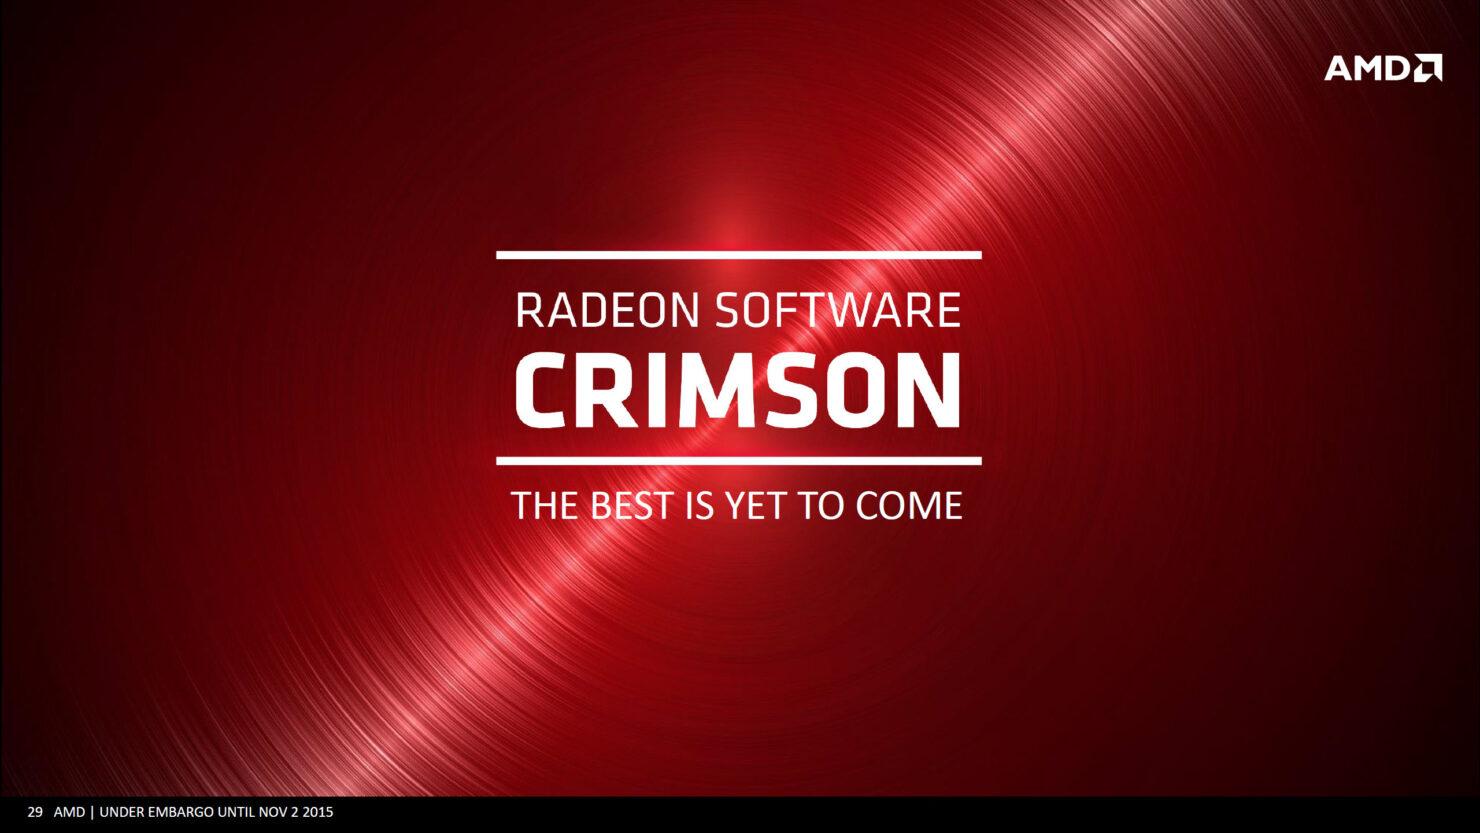 amd-radeon_crimson-driver_best-is-yet-to-come